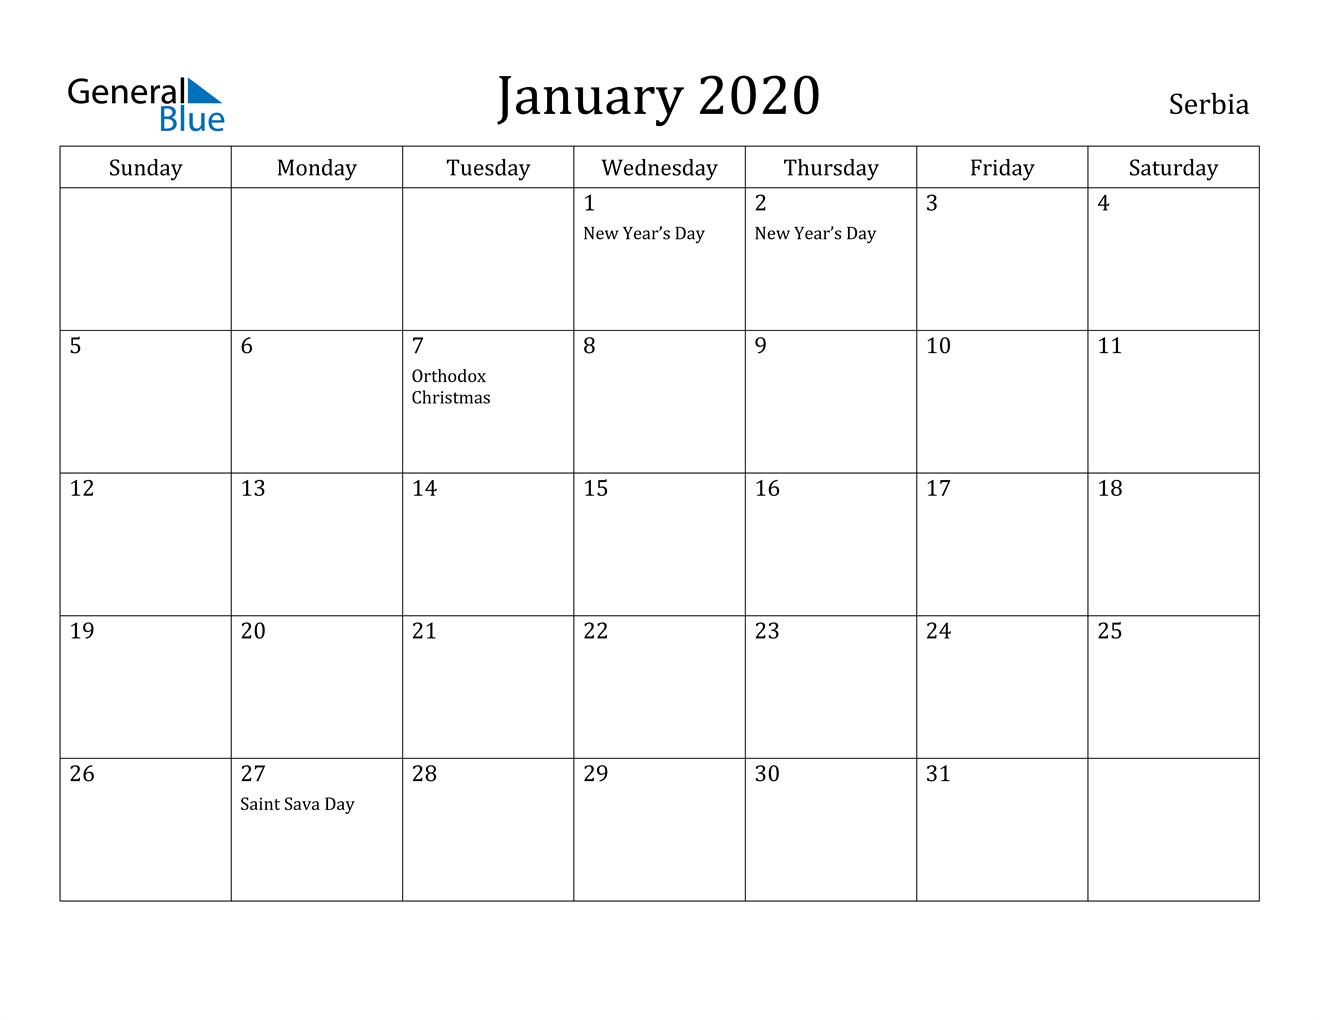 Image of January 2020 Serbia Calendar with Holidays Calendar